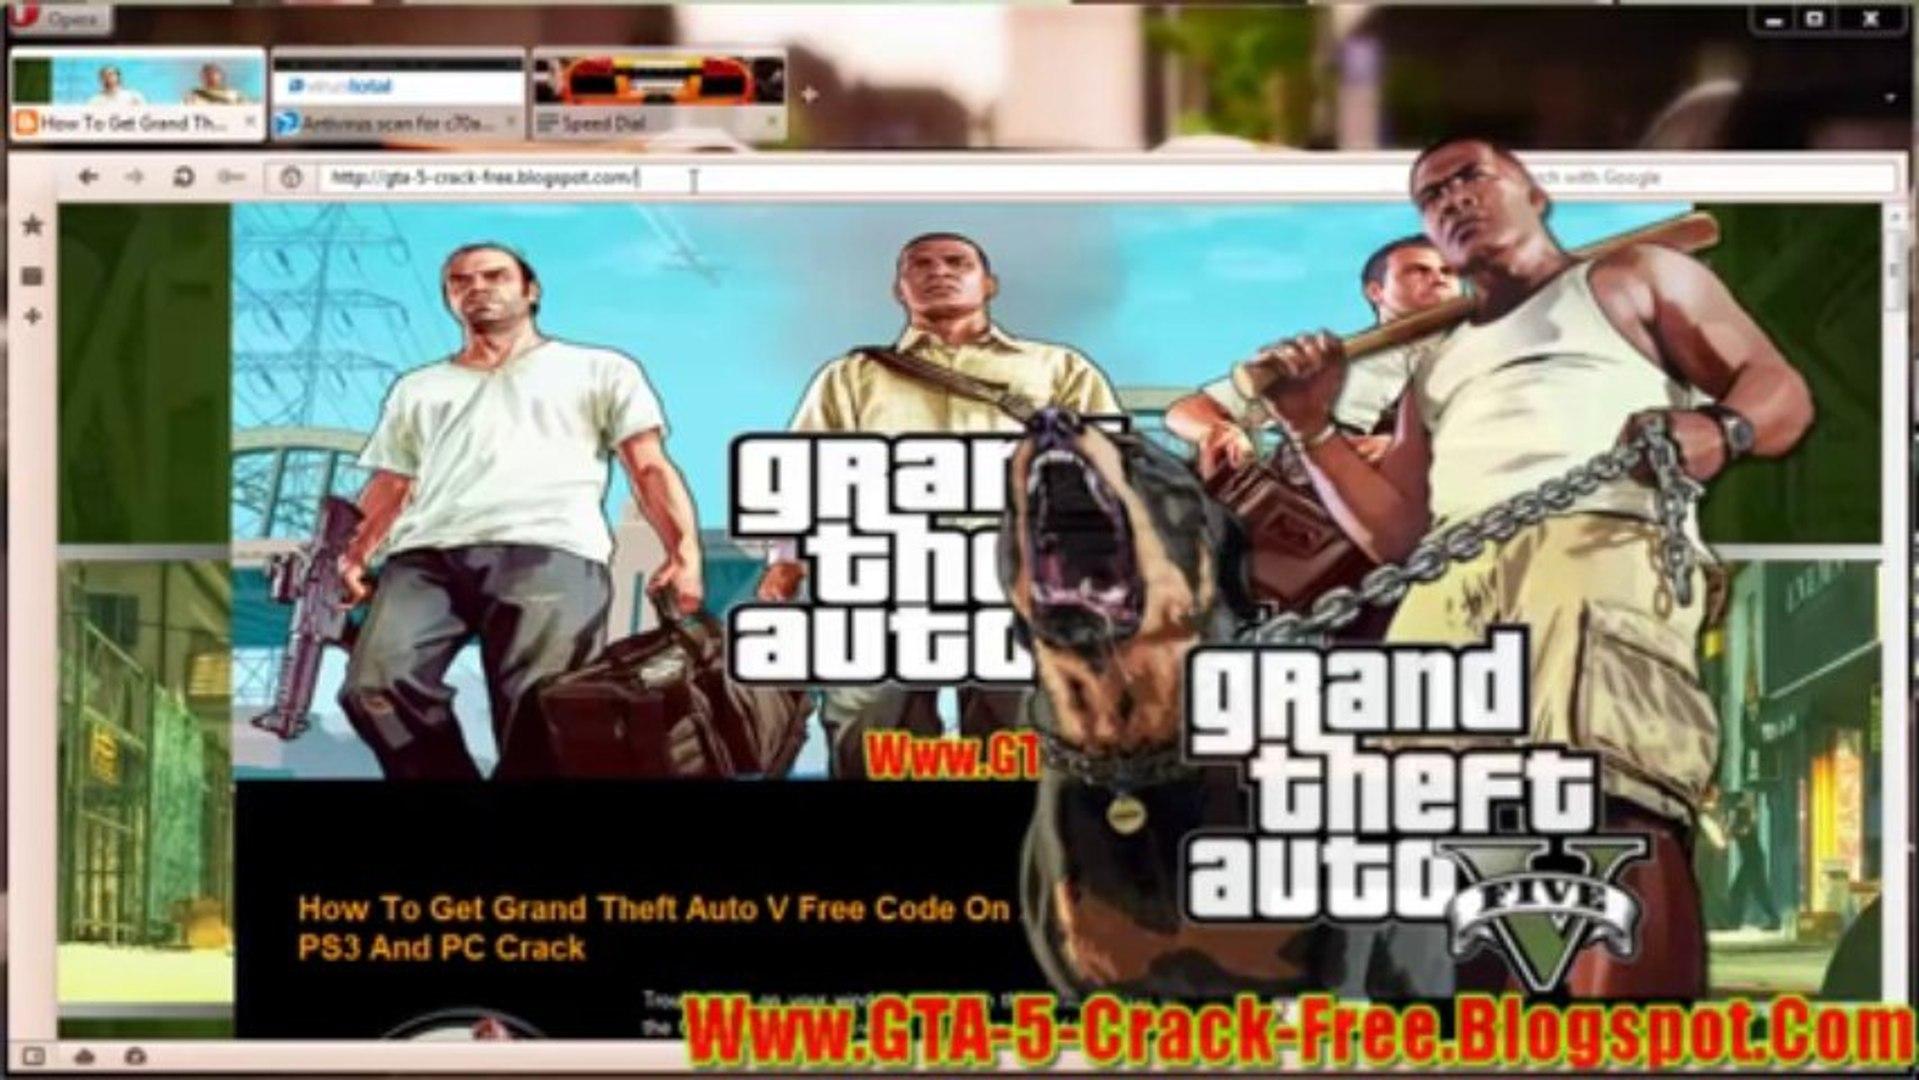 Grand Theft Auto 5 Free Redeem Code On Xbox360/PS3